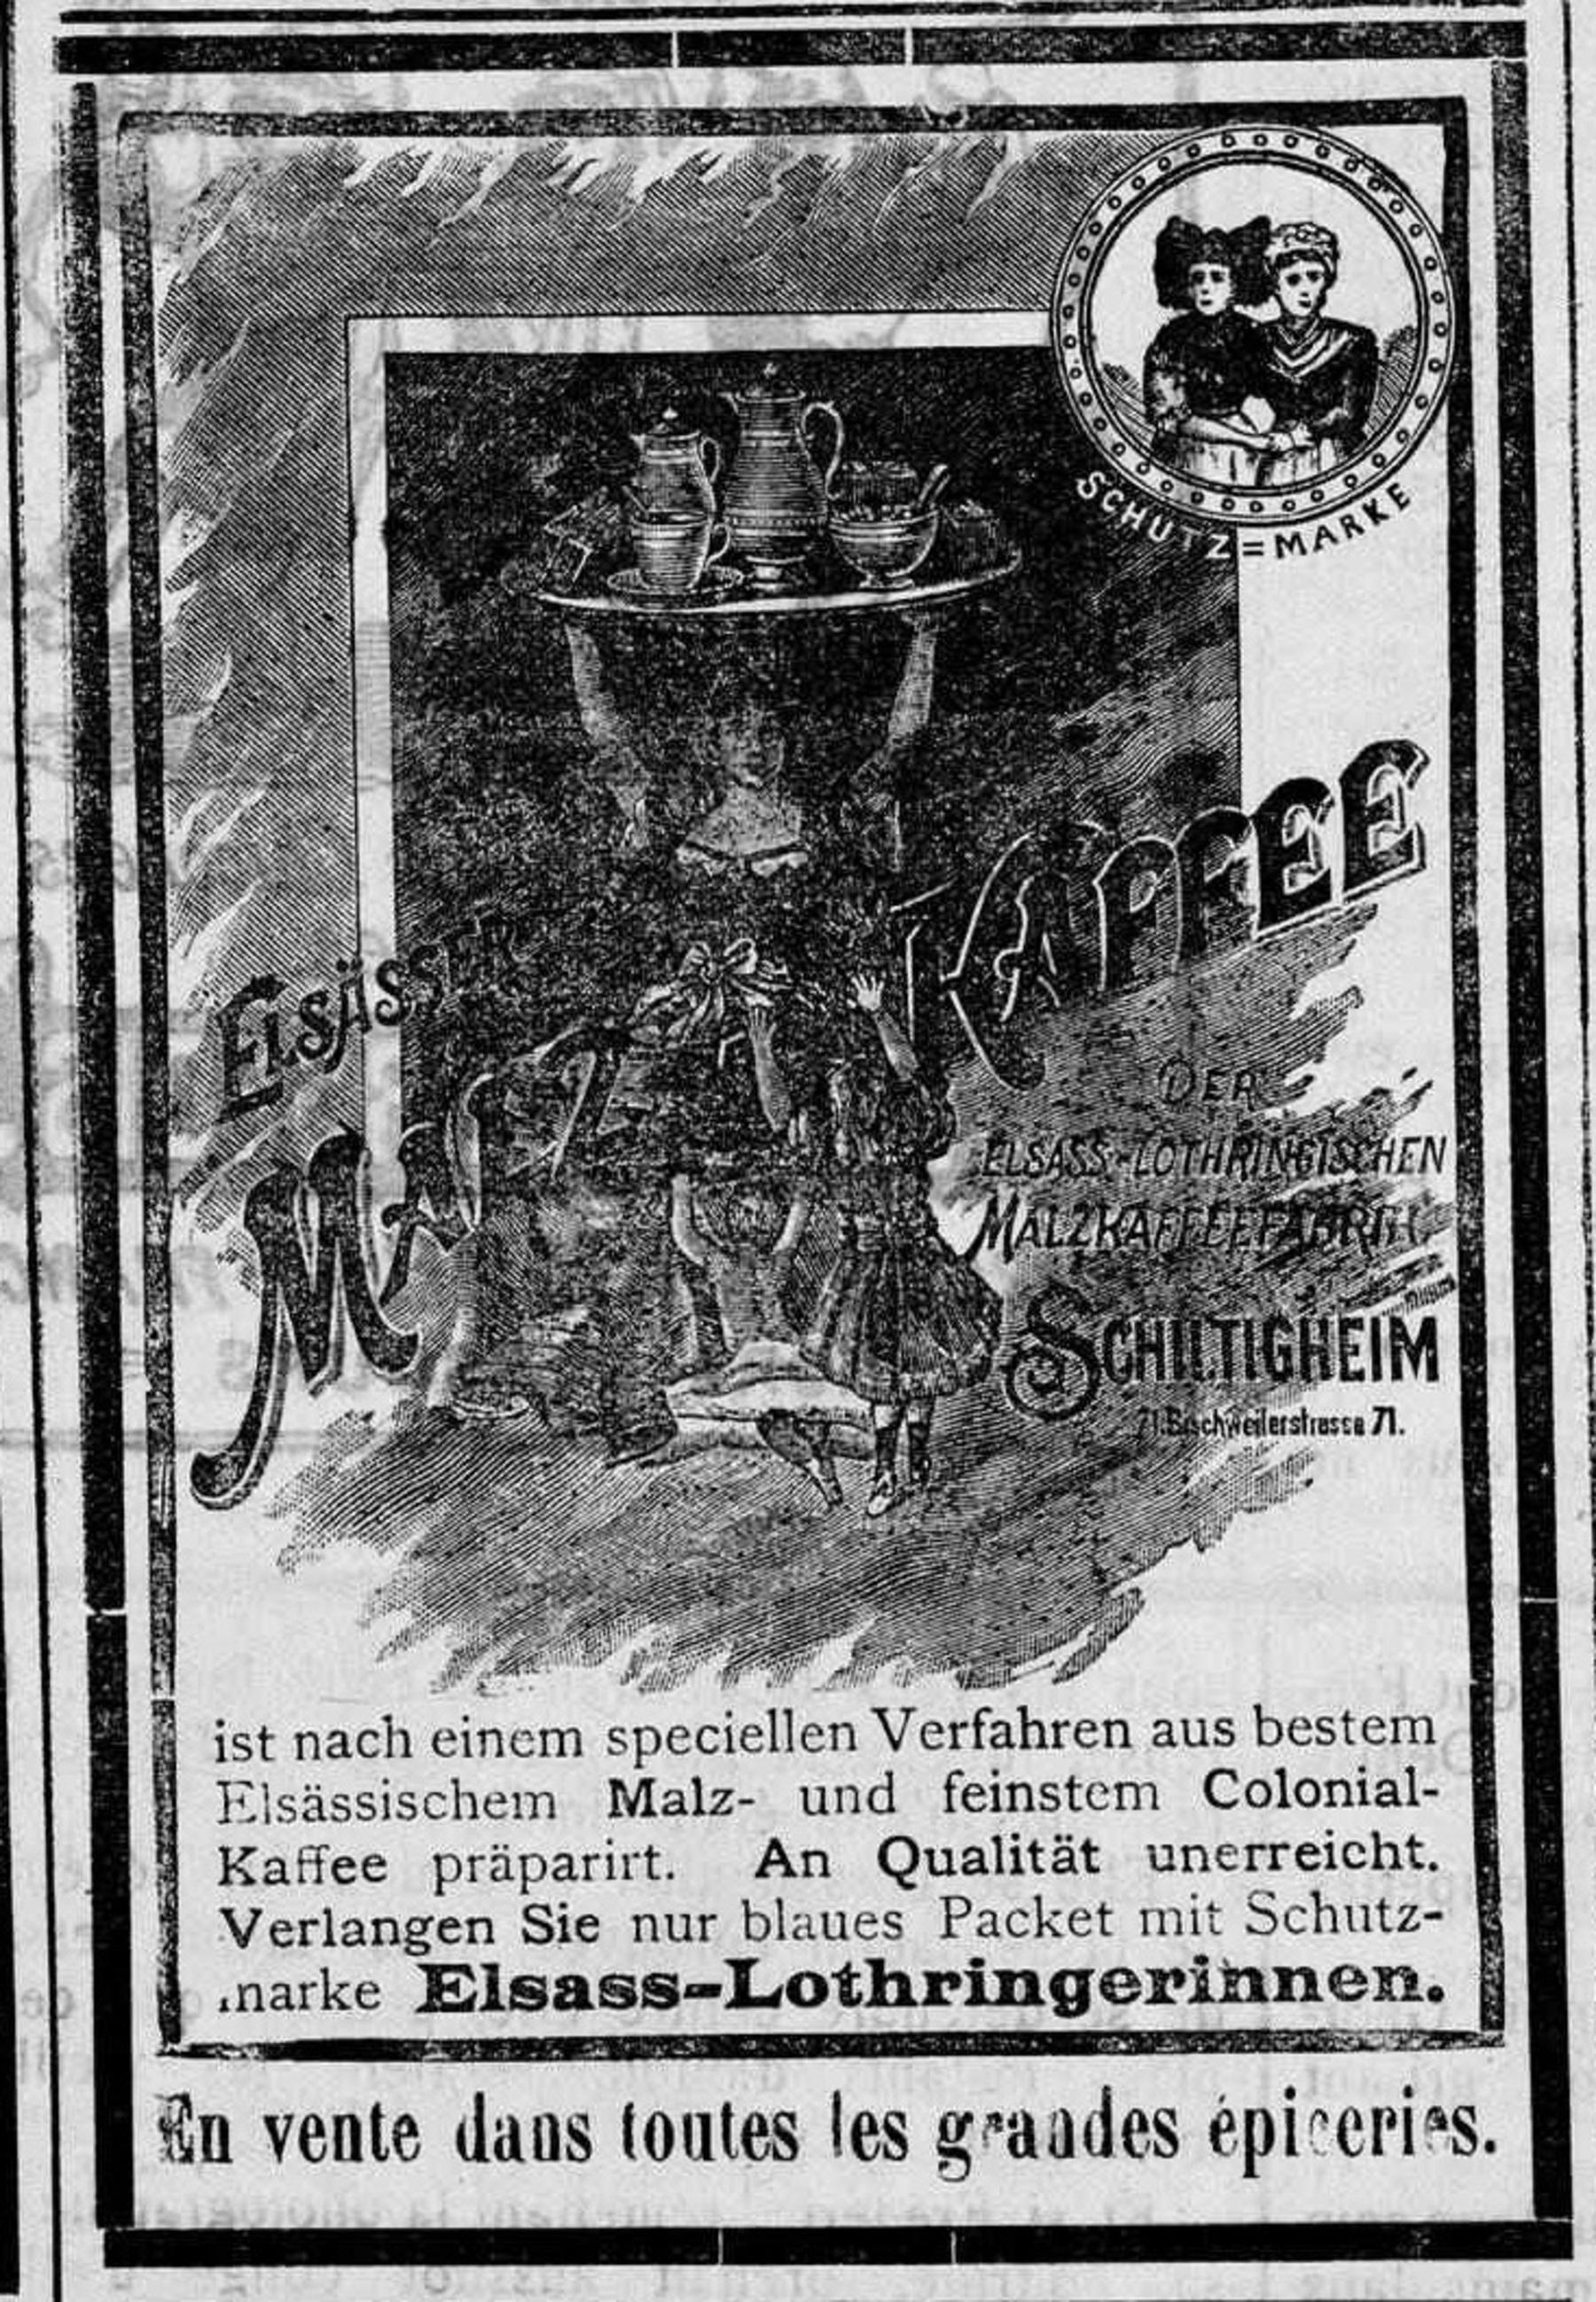 Contenu du Elsässer Malz-Kaffee